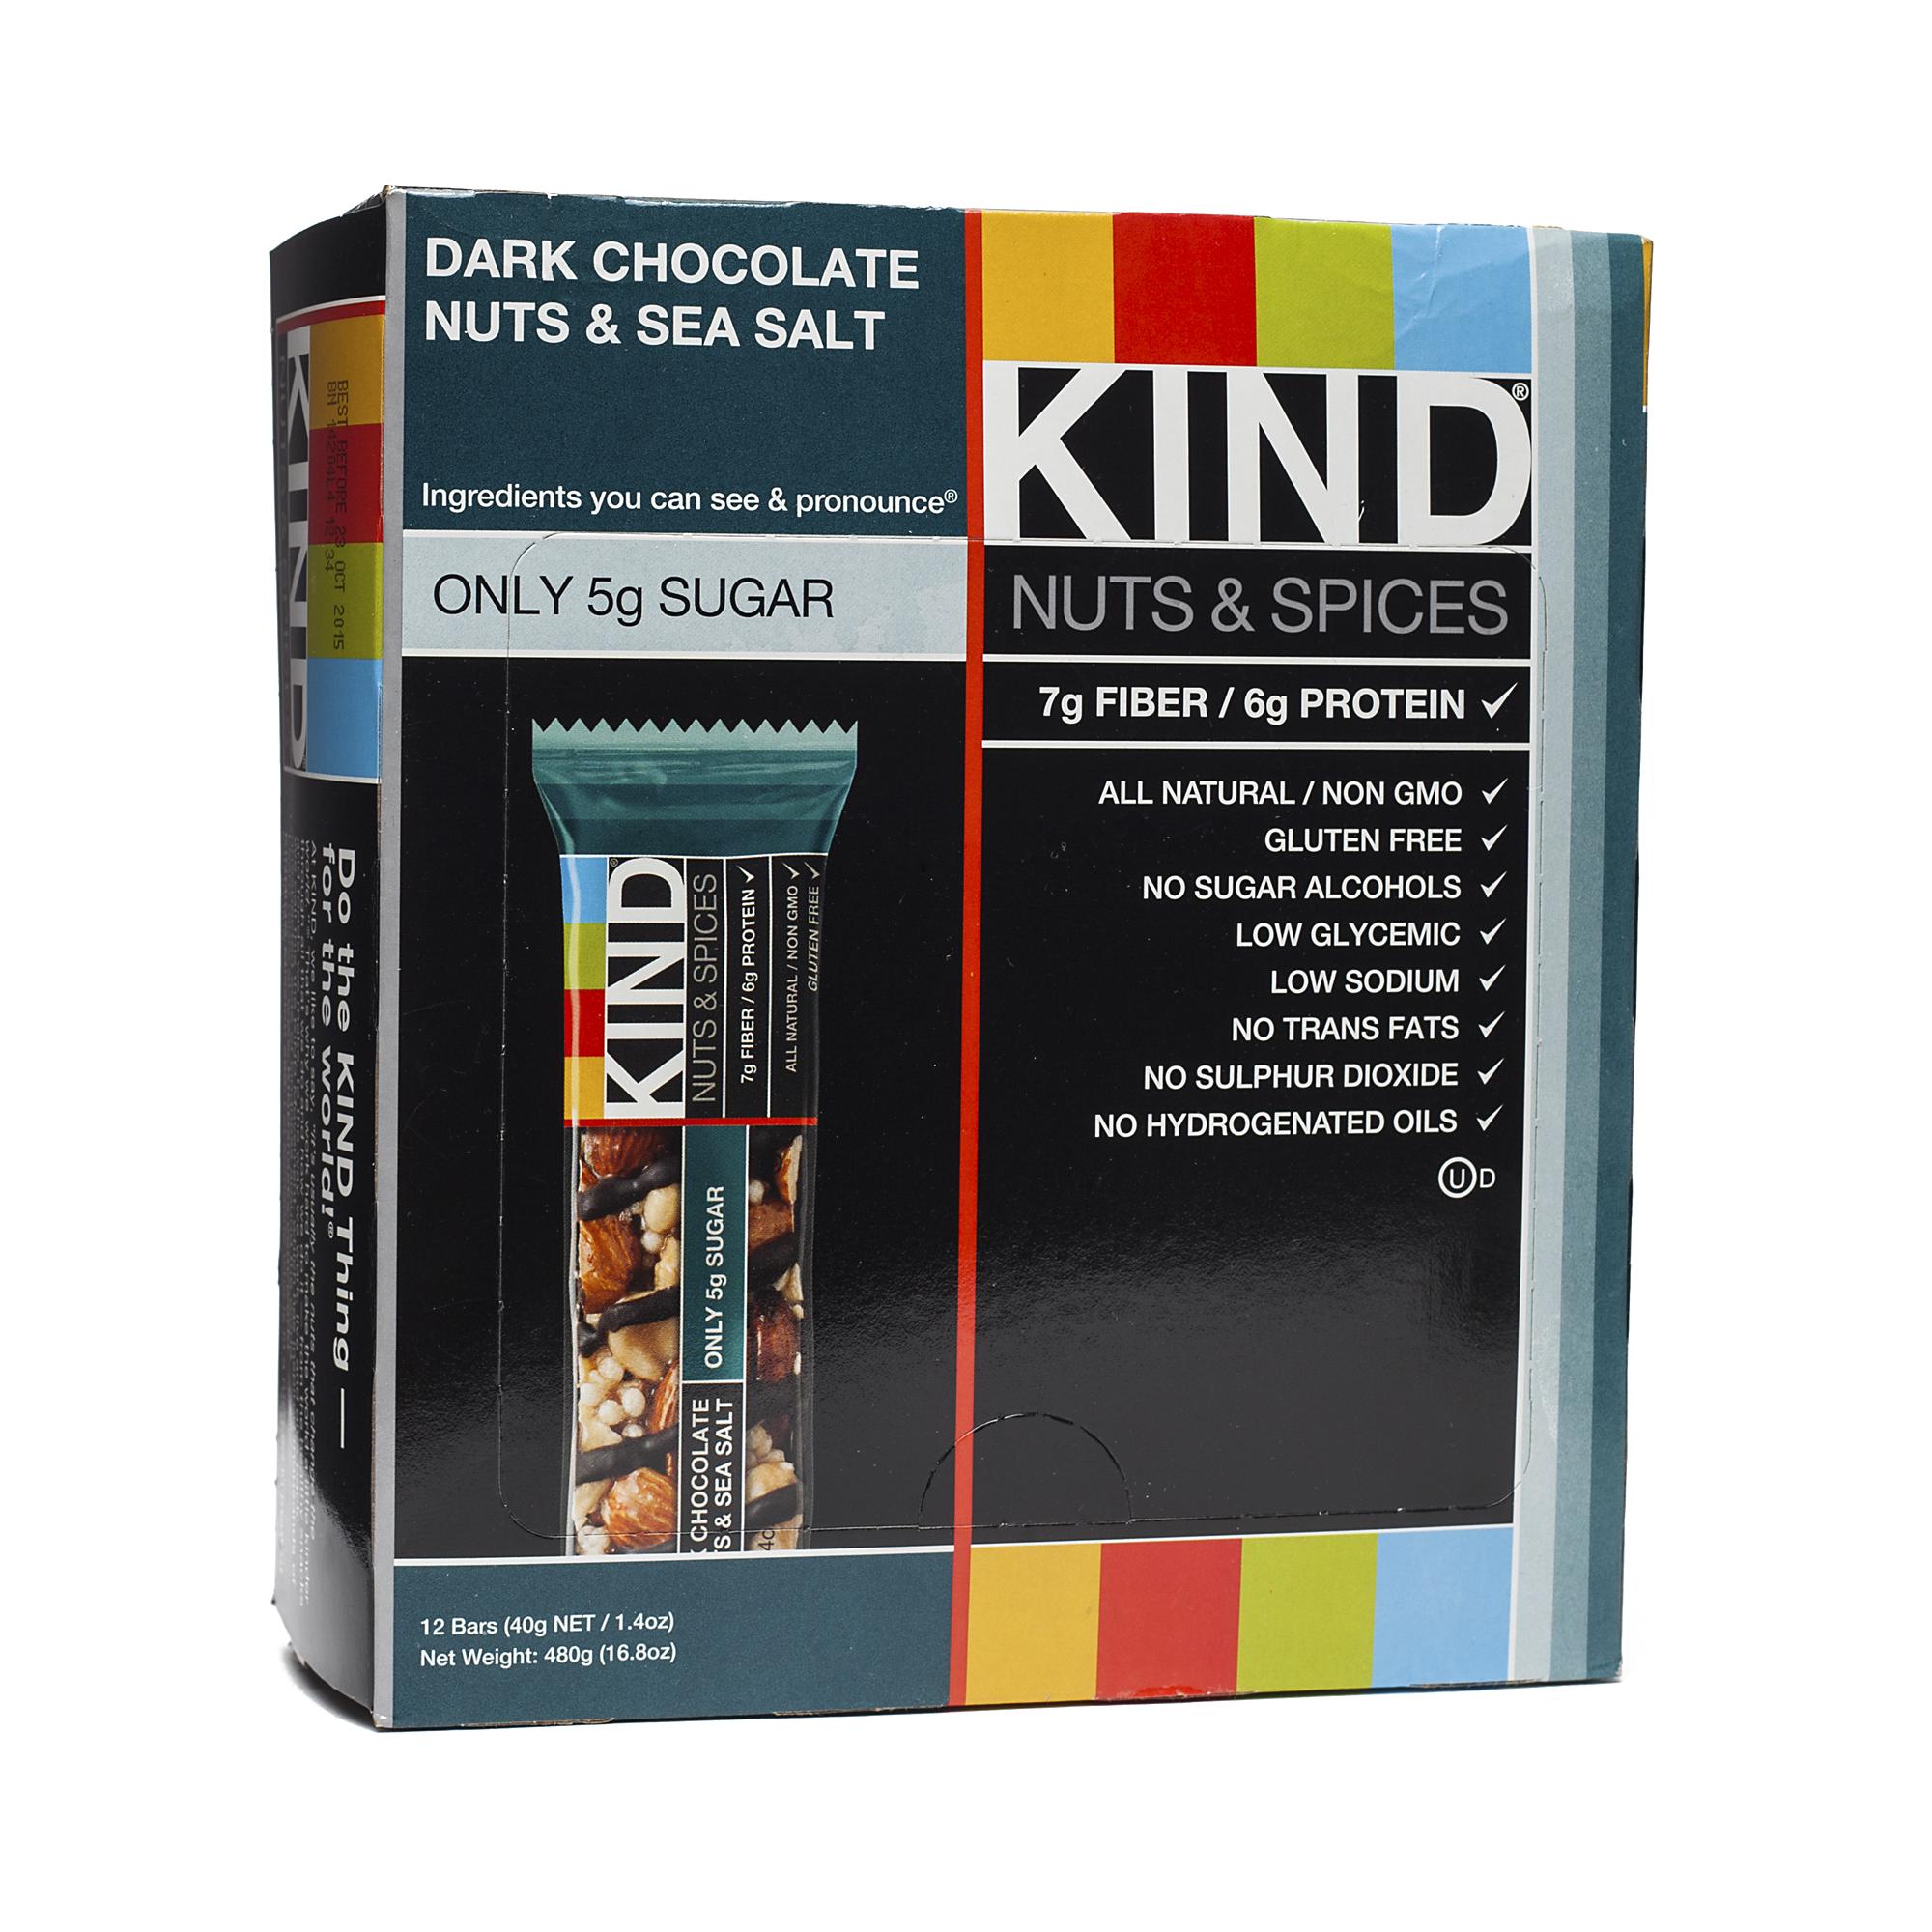 Dark Chocolate Nuts & Sea Salt Bars by Kind - Thrive Market